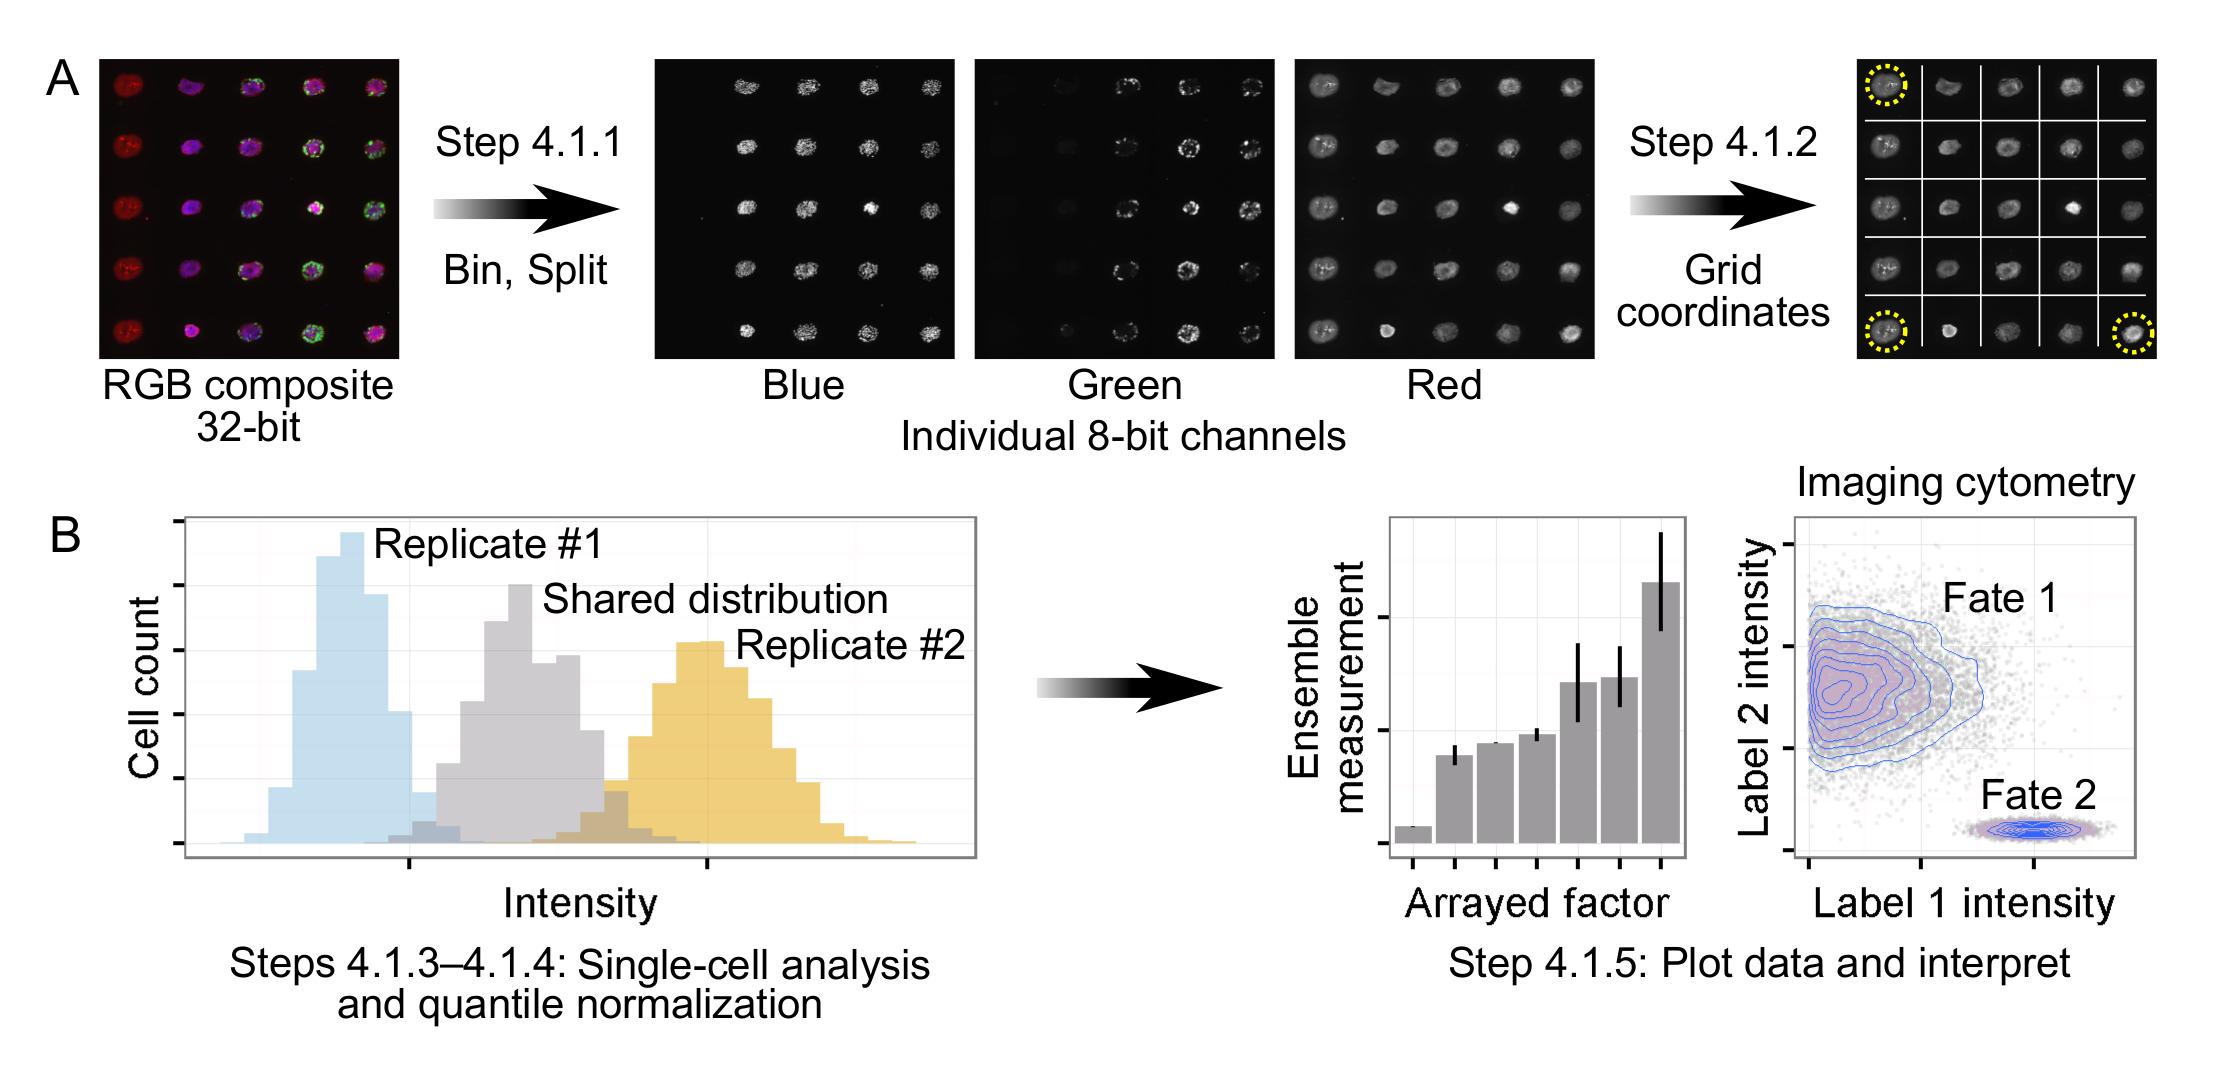 A High-throughput Cell Microarray Platform for Correlative